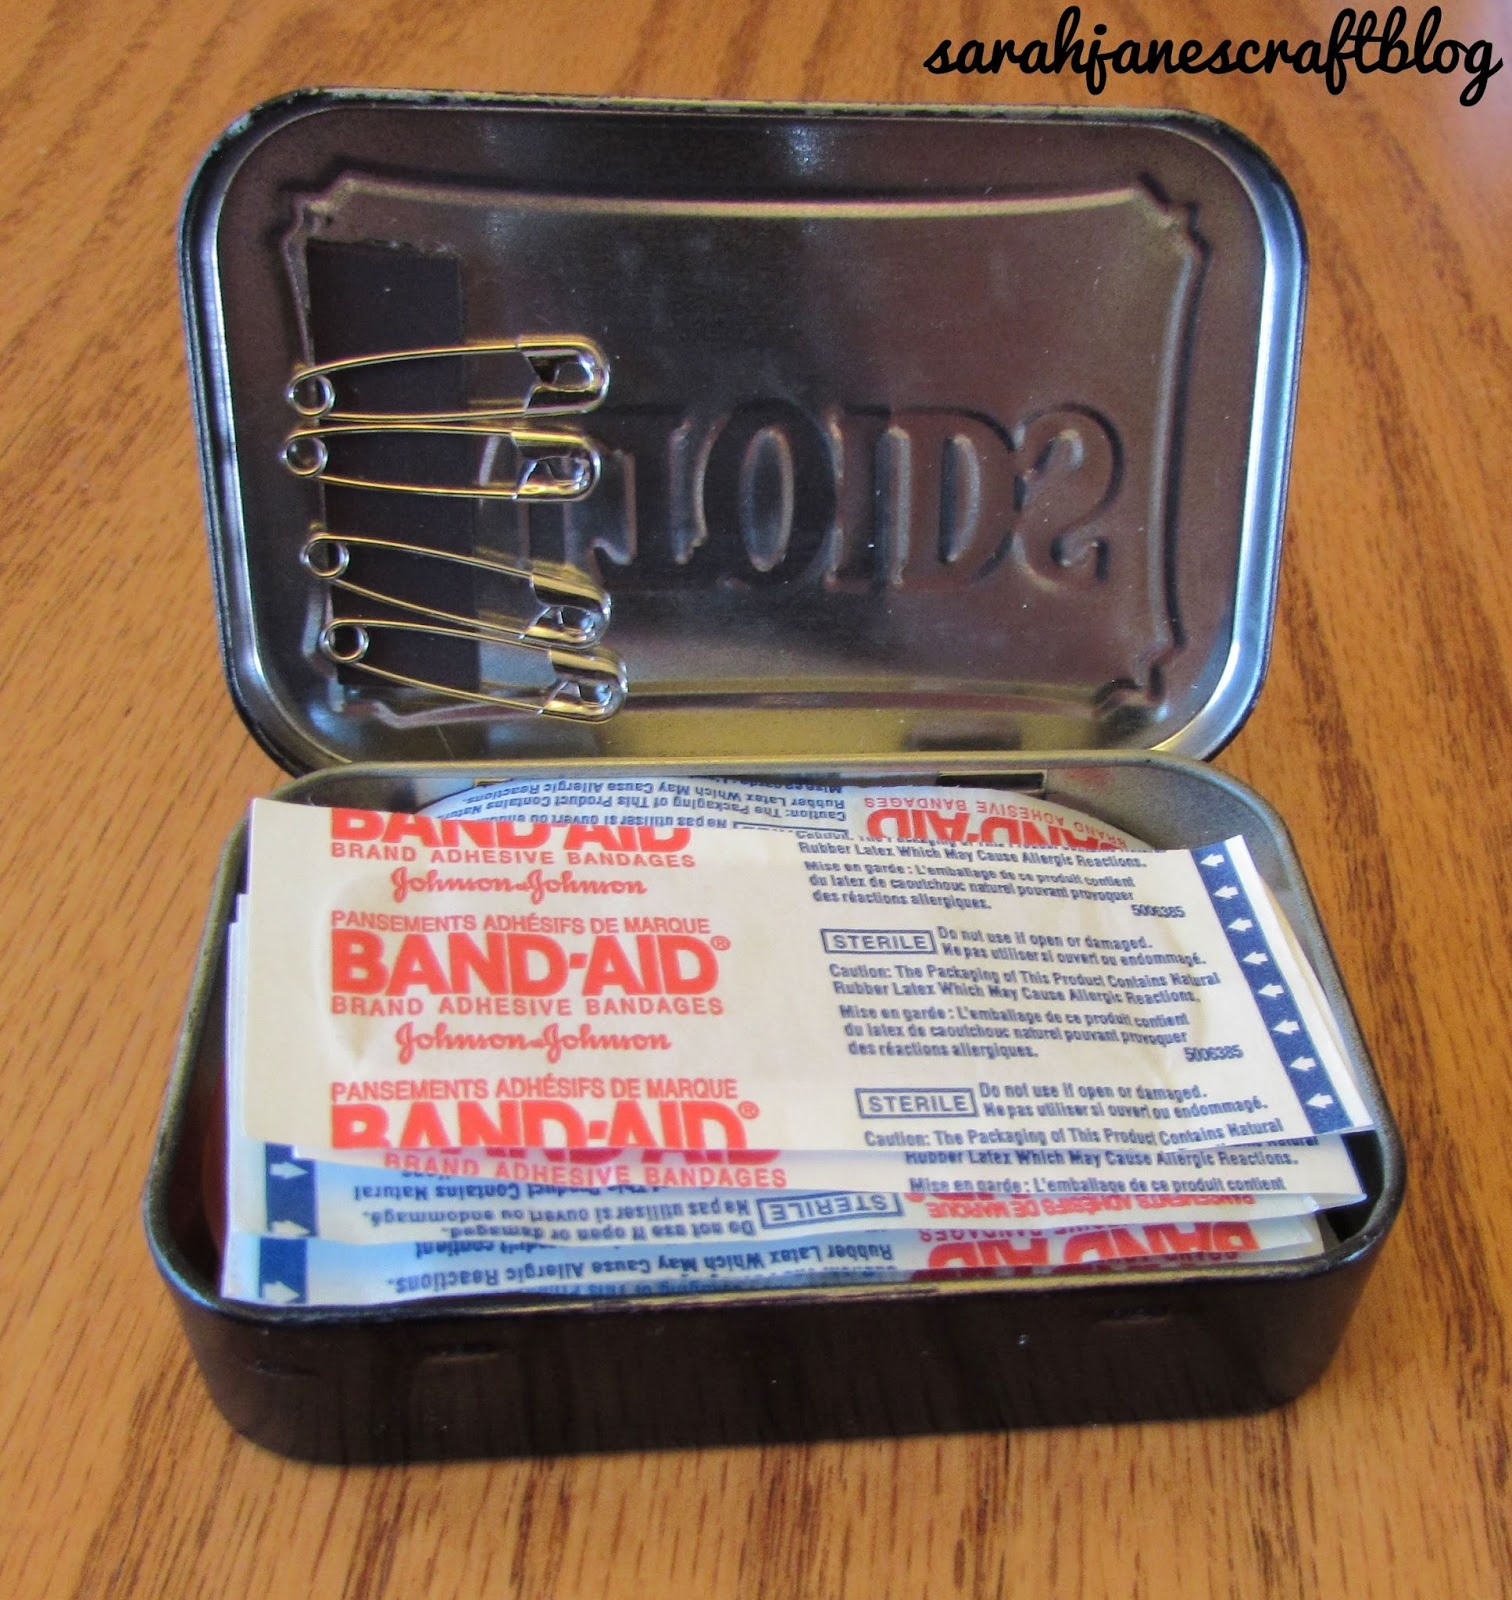 sarah jane s craft blog recycled altoids tin first aid kit